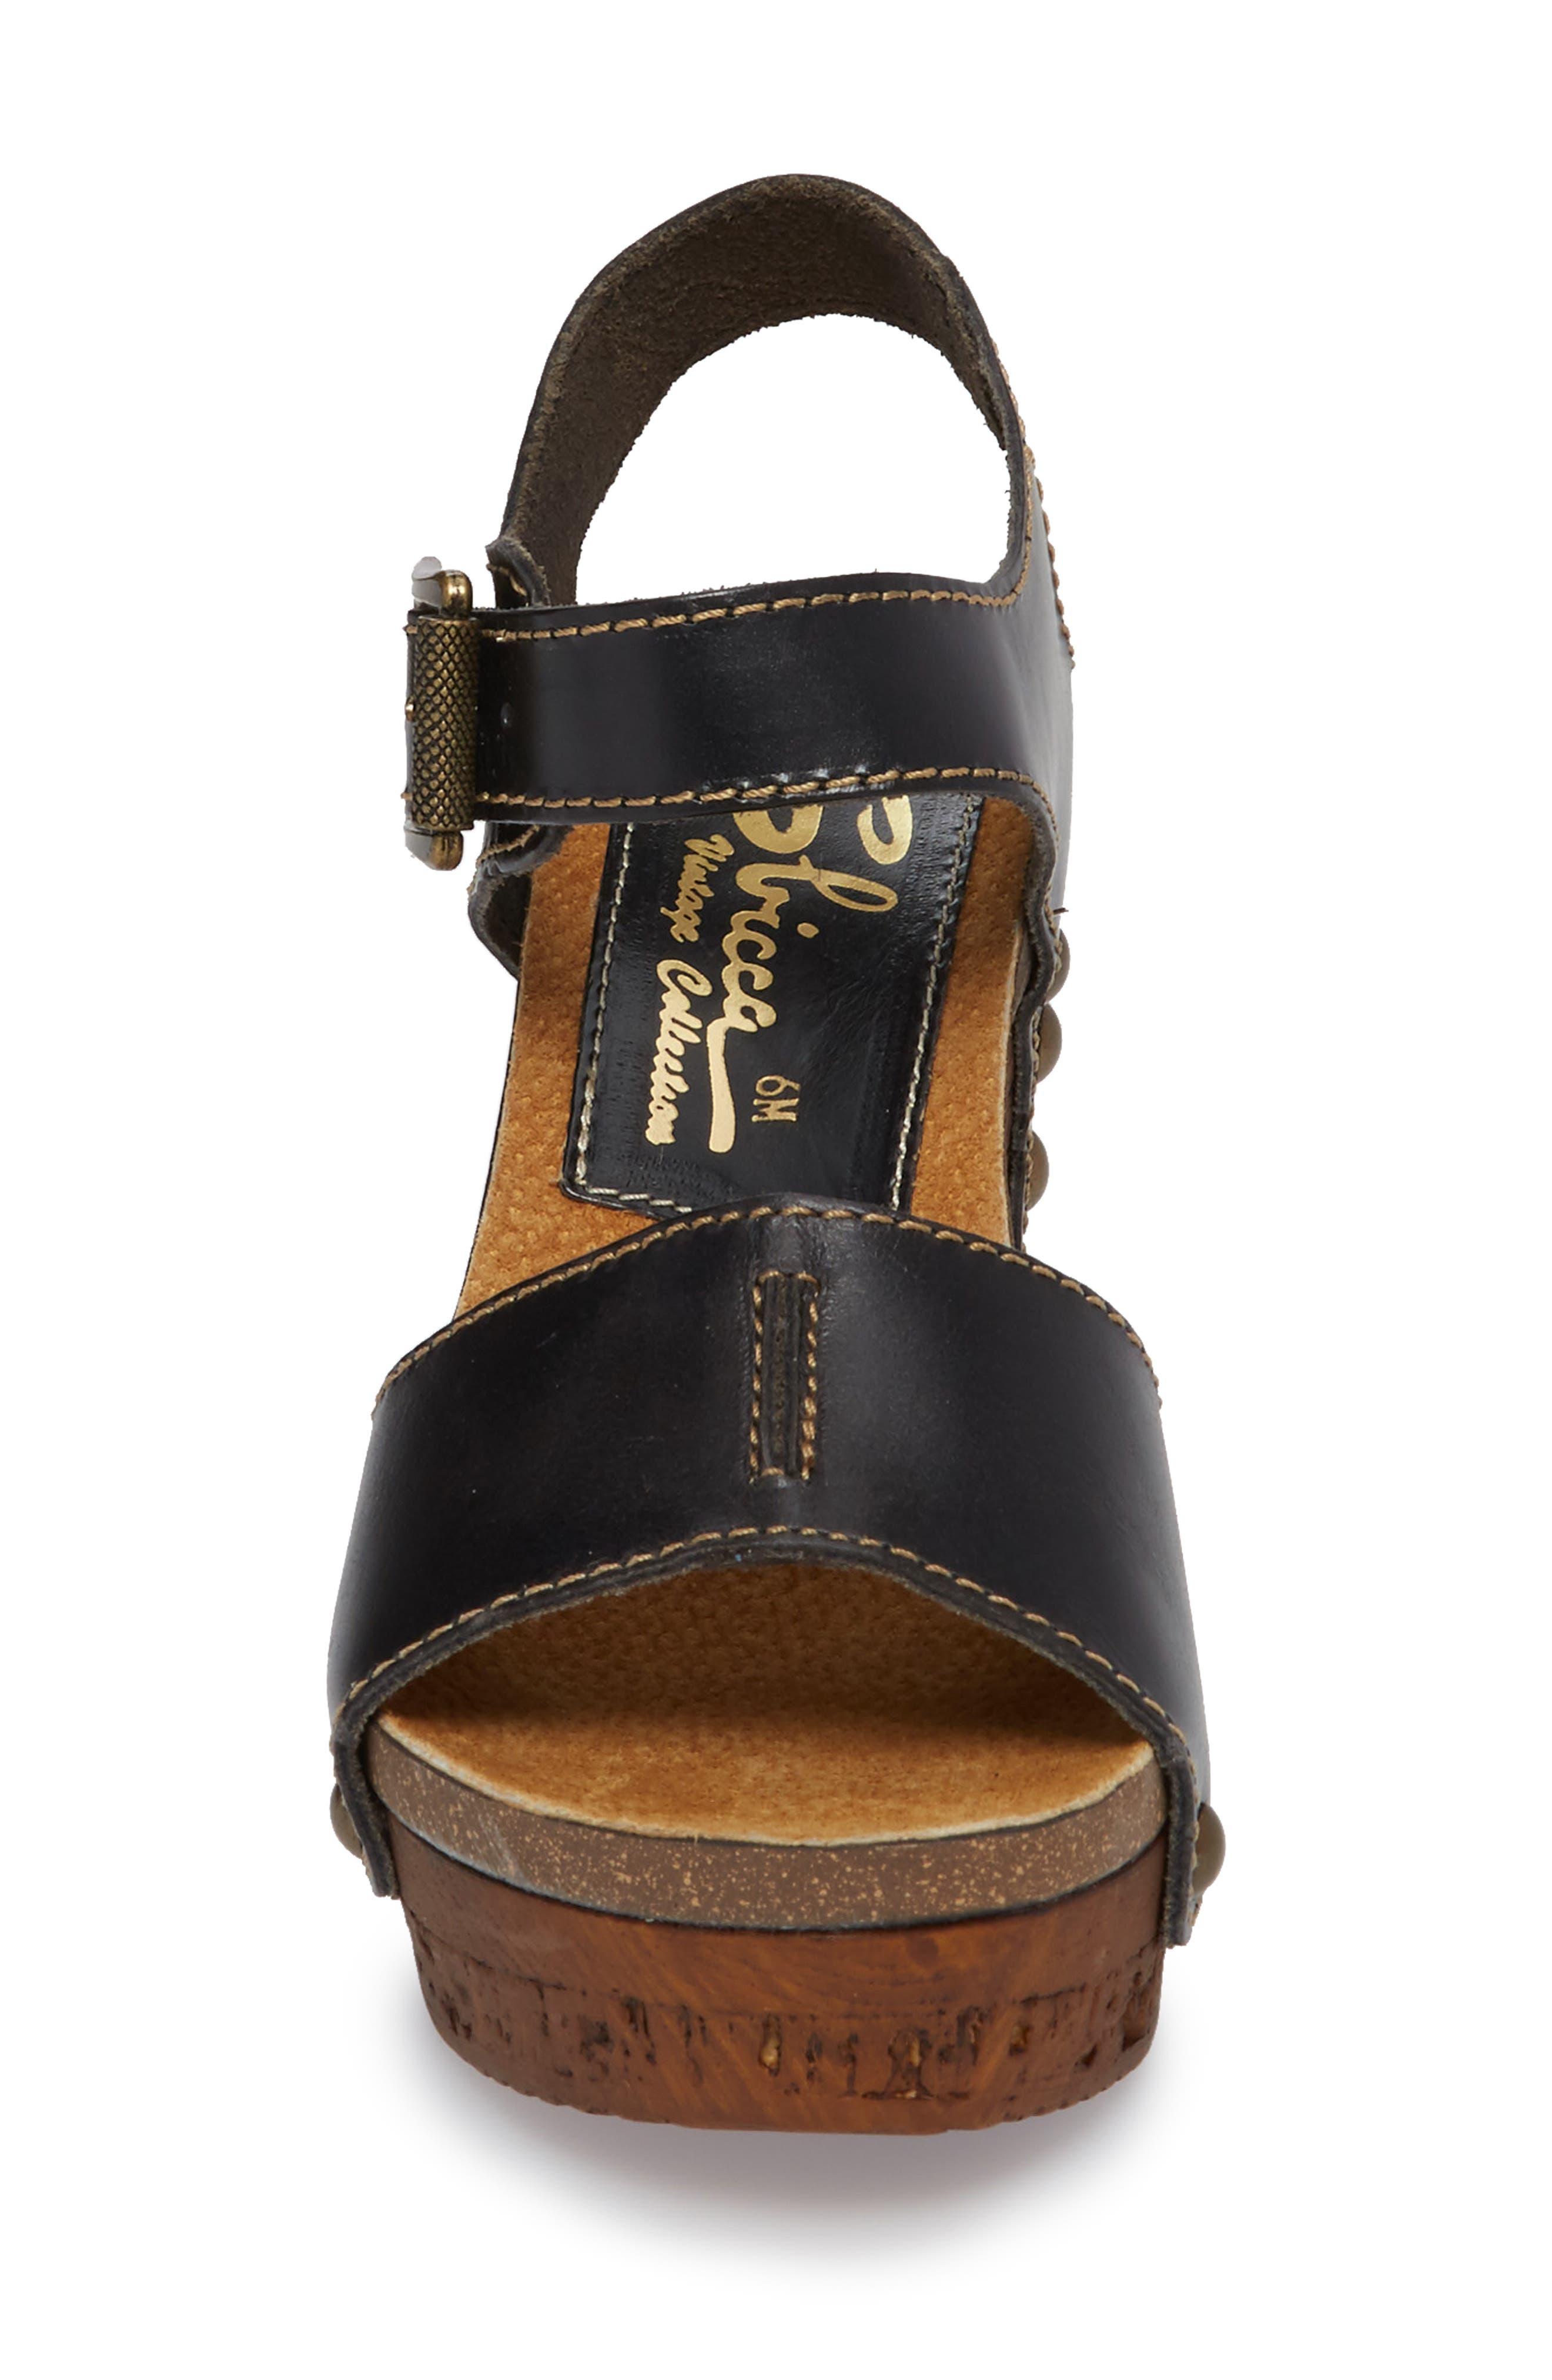 Brella Studded Platform Wedge Sandal,                             Alternate thumbnail 4, color,                             BLACK